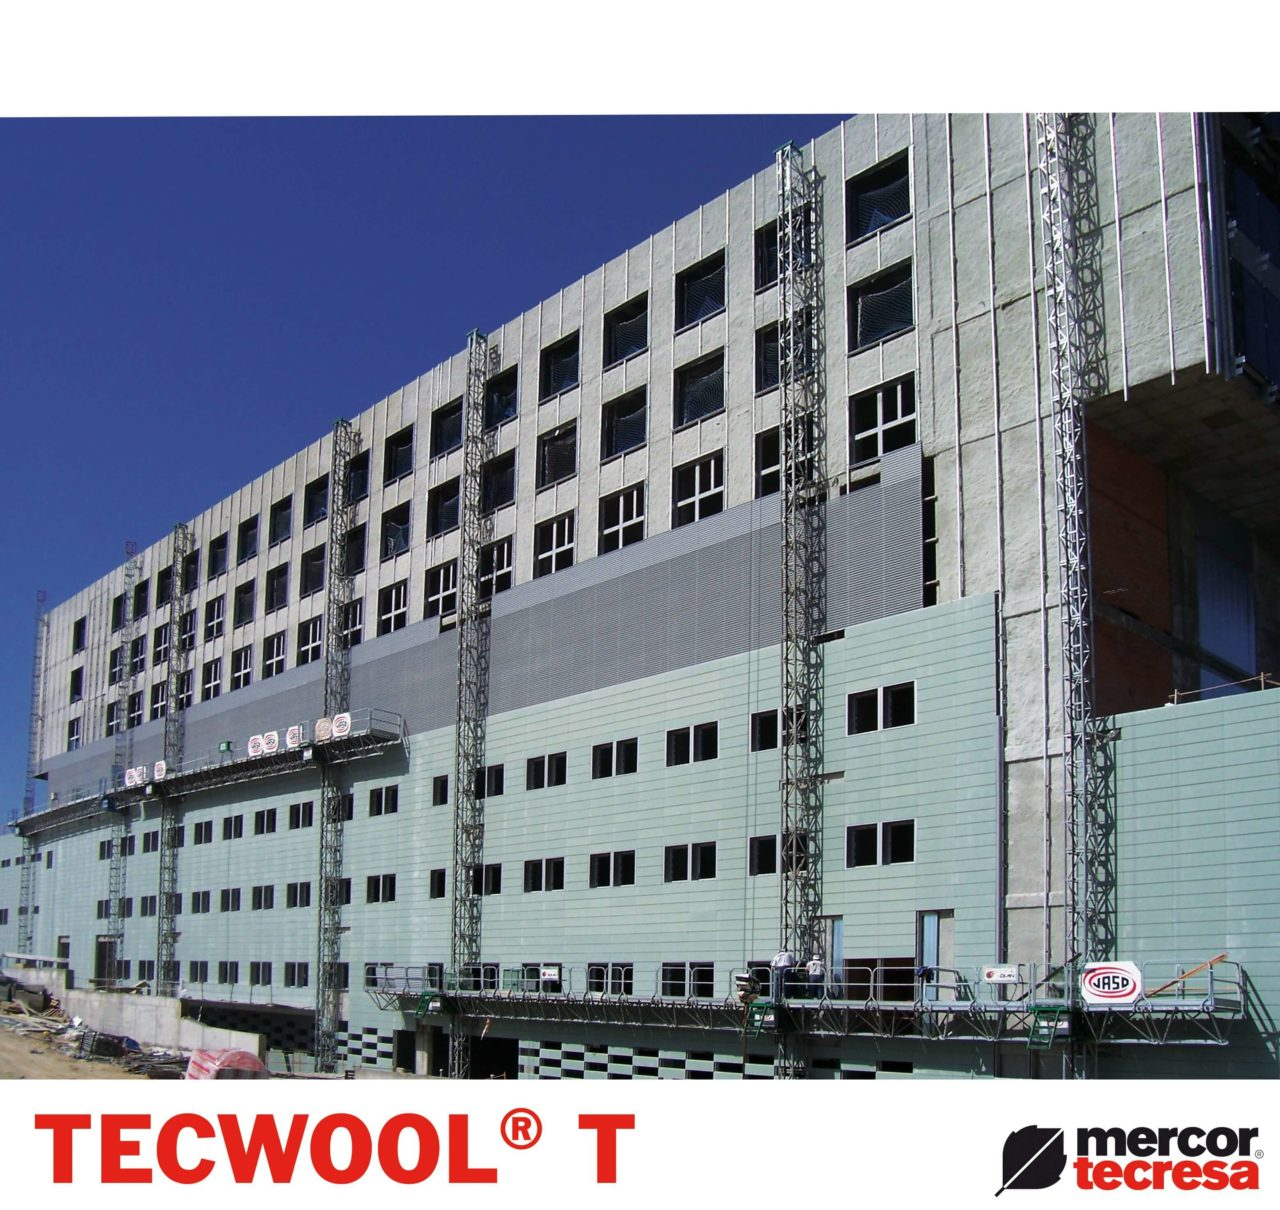 Tecwool T Mortar